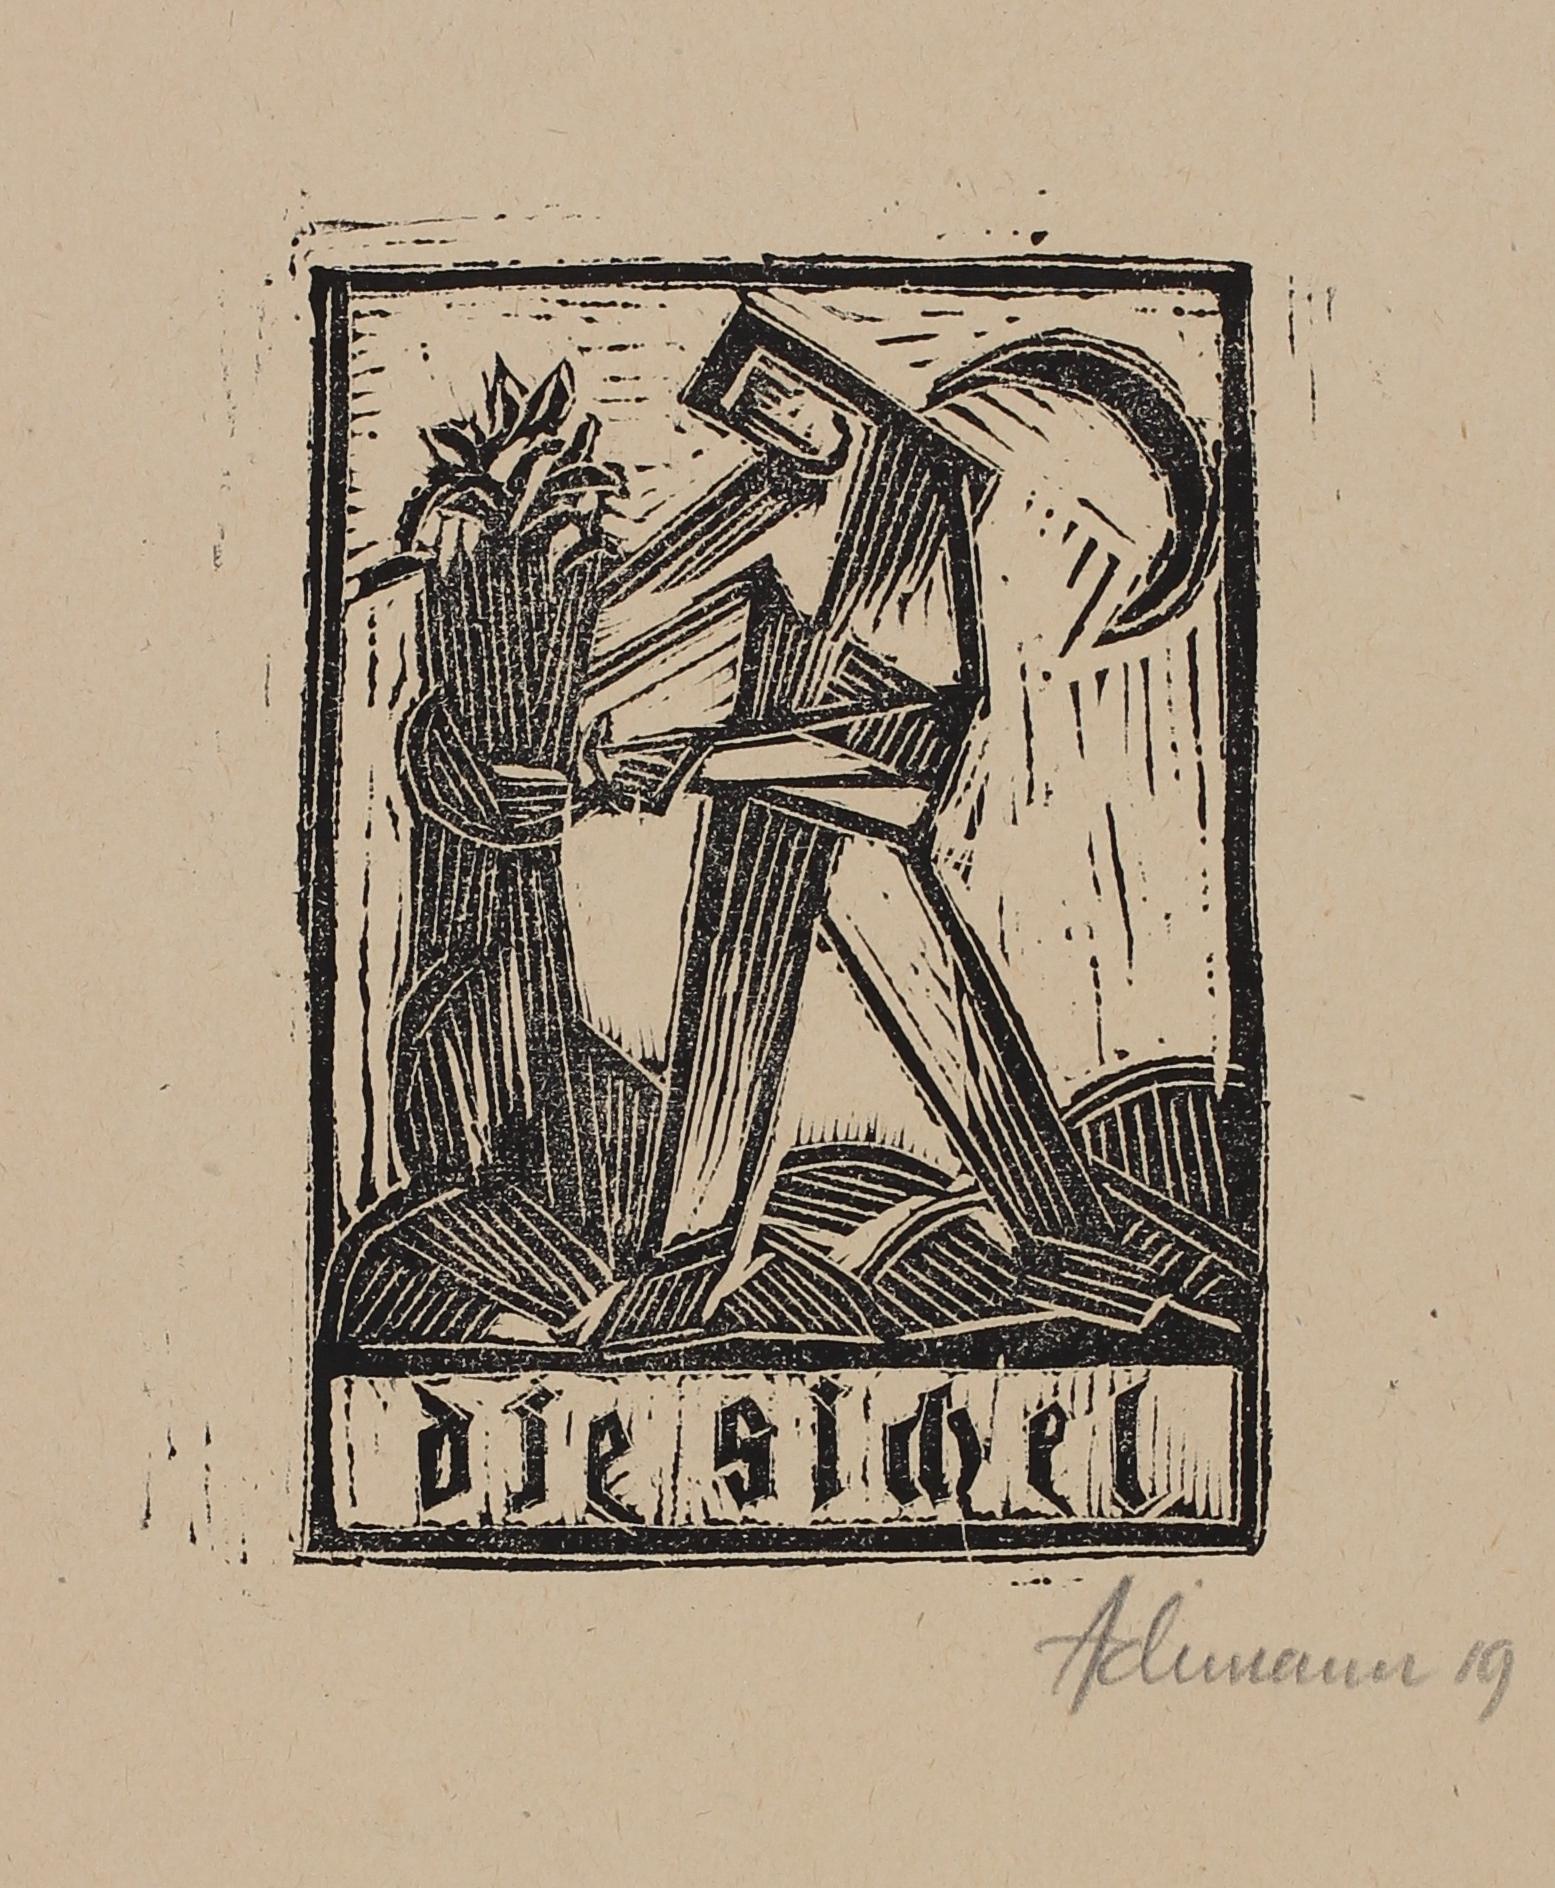 Die Sichel (The Sickle) by Josef Achmann